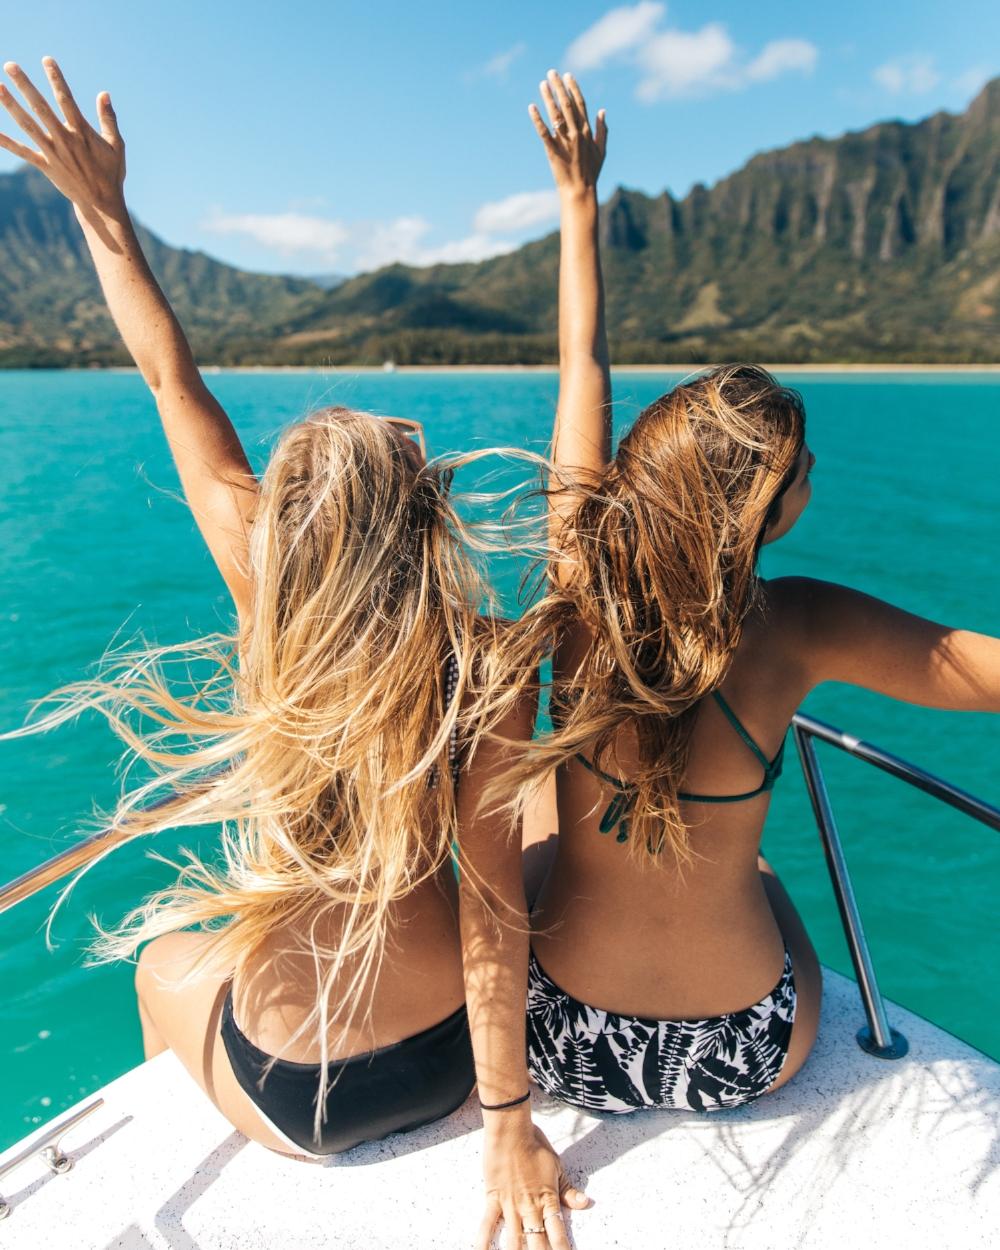 oahu_hawaii_boat_ride.jpg